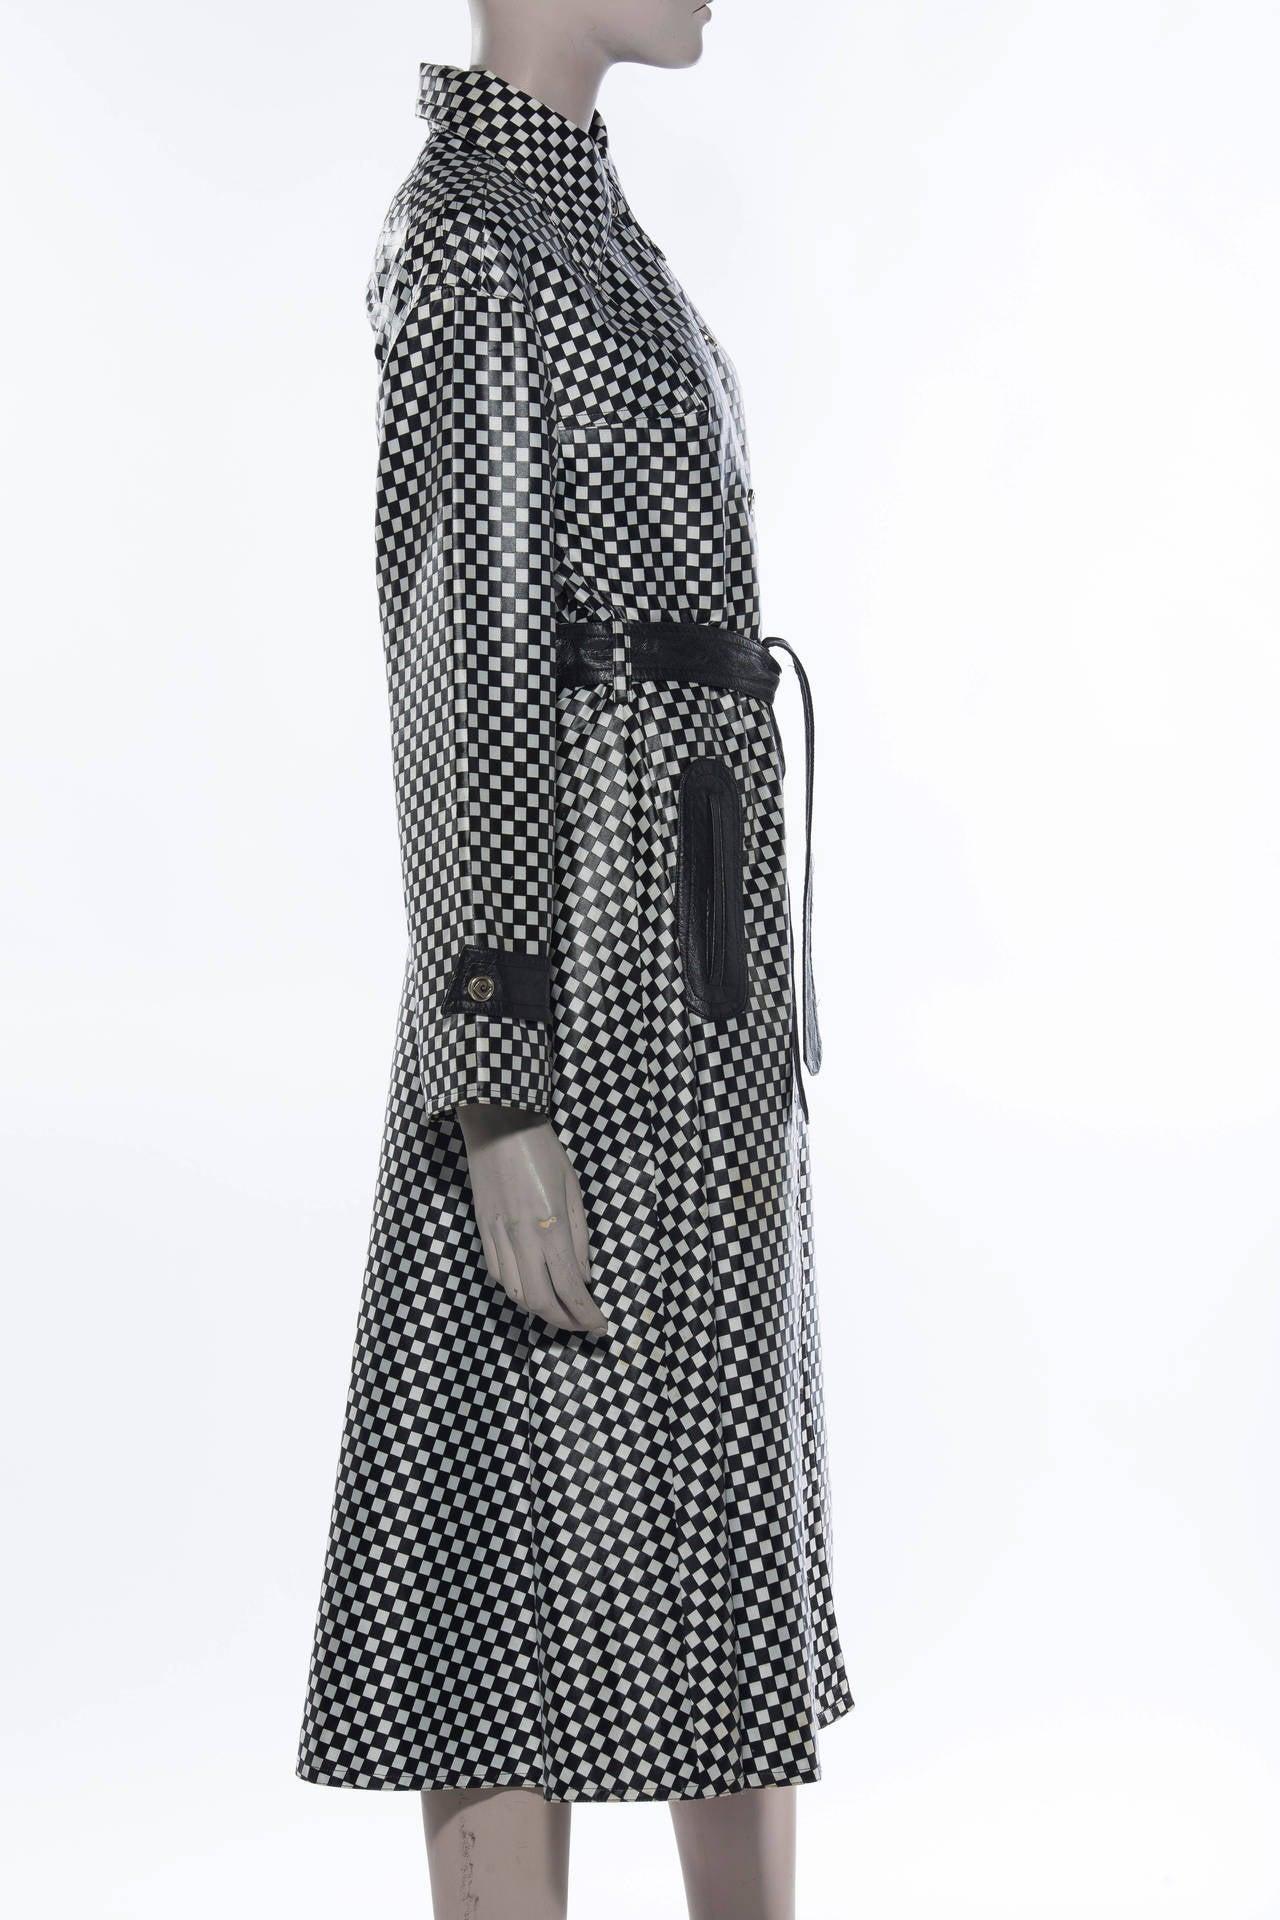 Women's Pierre Cardin Circa 1960s For Sale